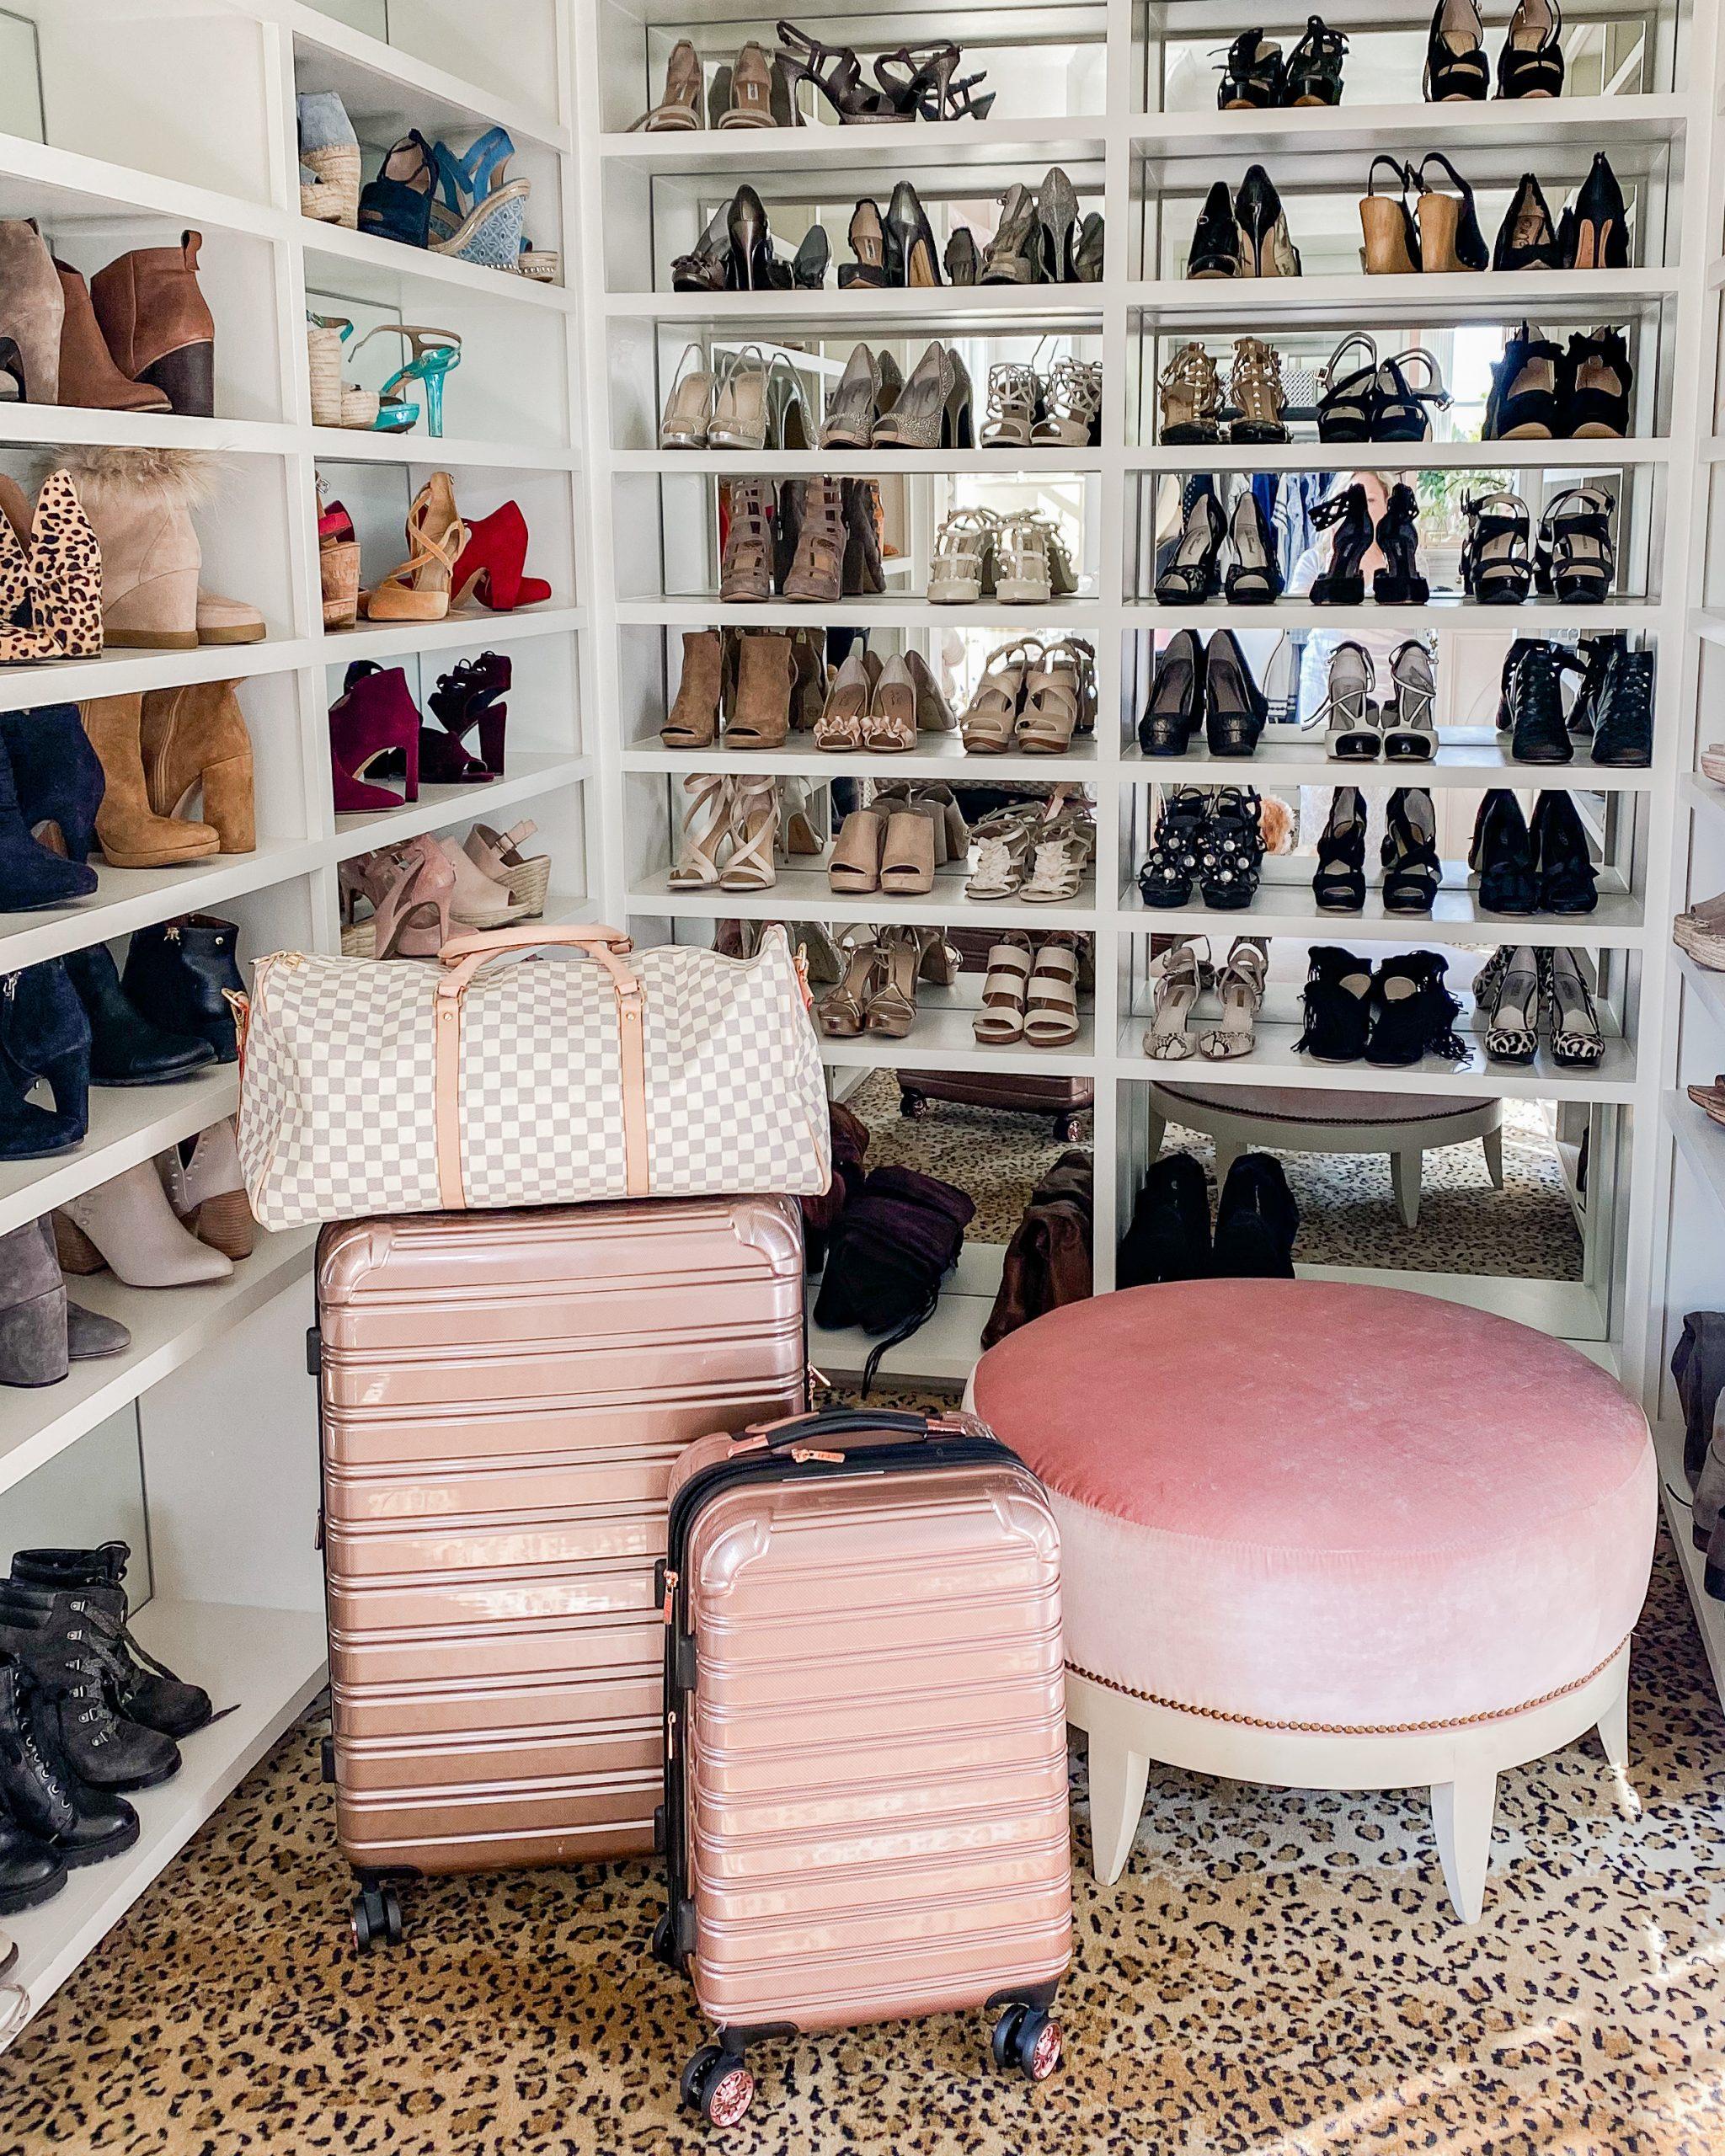 closet packing luggage